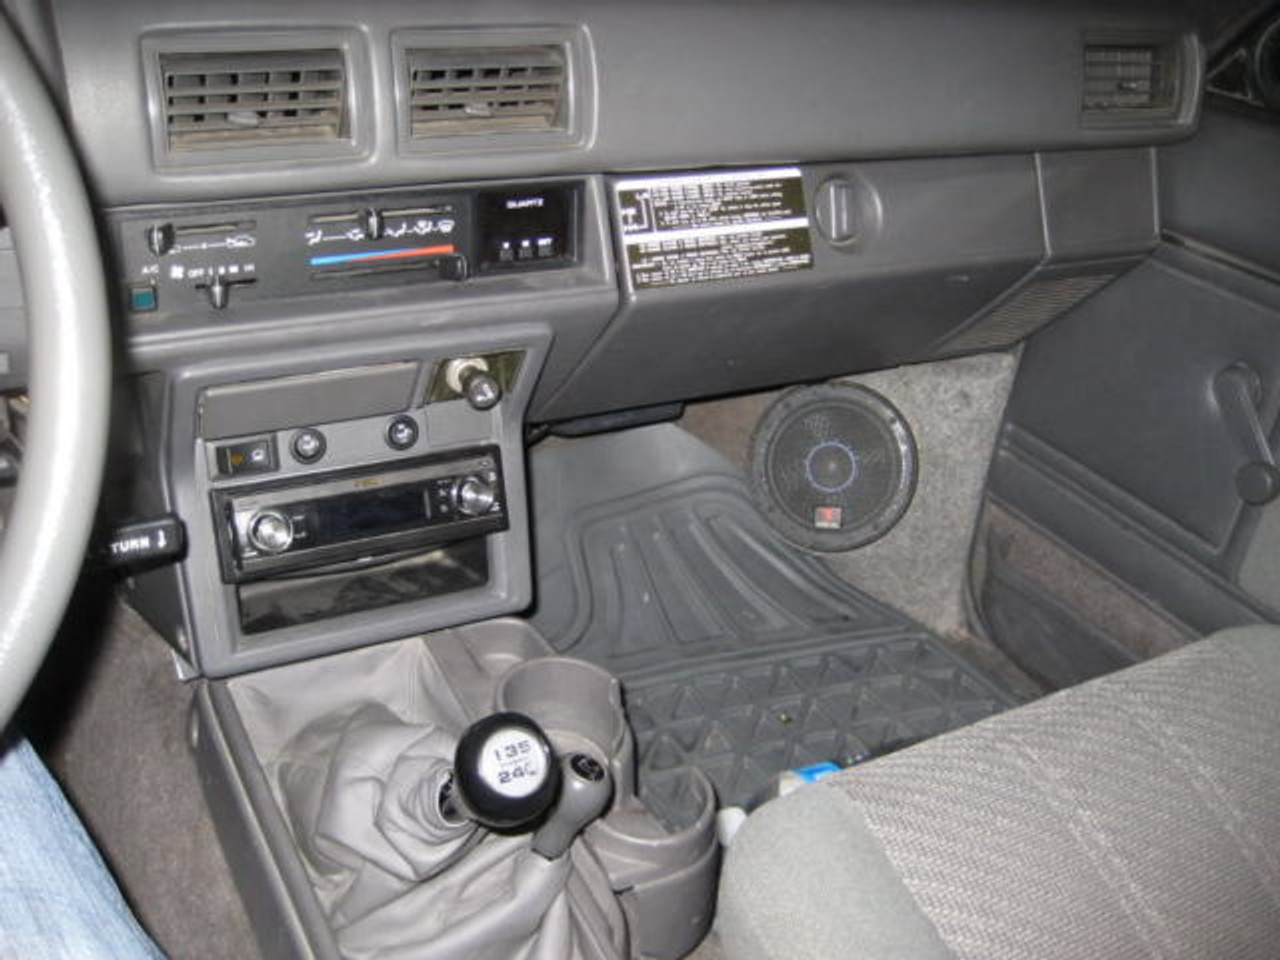 1984 1985 1986 1987 1988 1989 1990 1991 1992 1993 1994 - 1993 toyota pickup interior parts ...